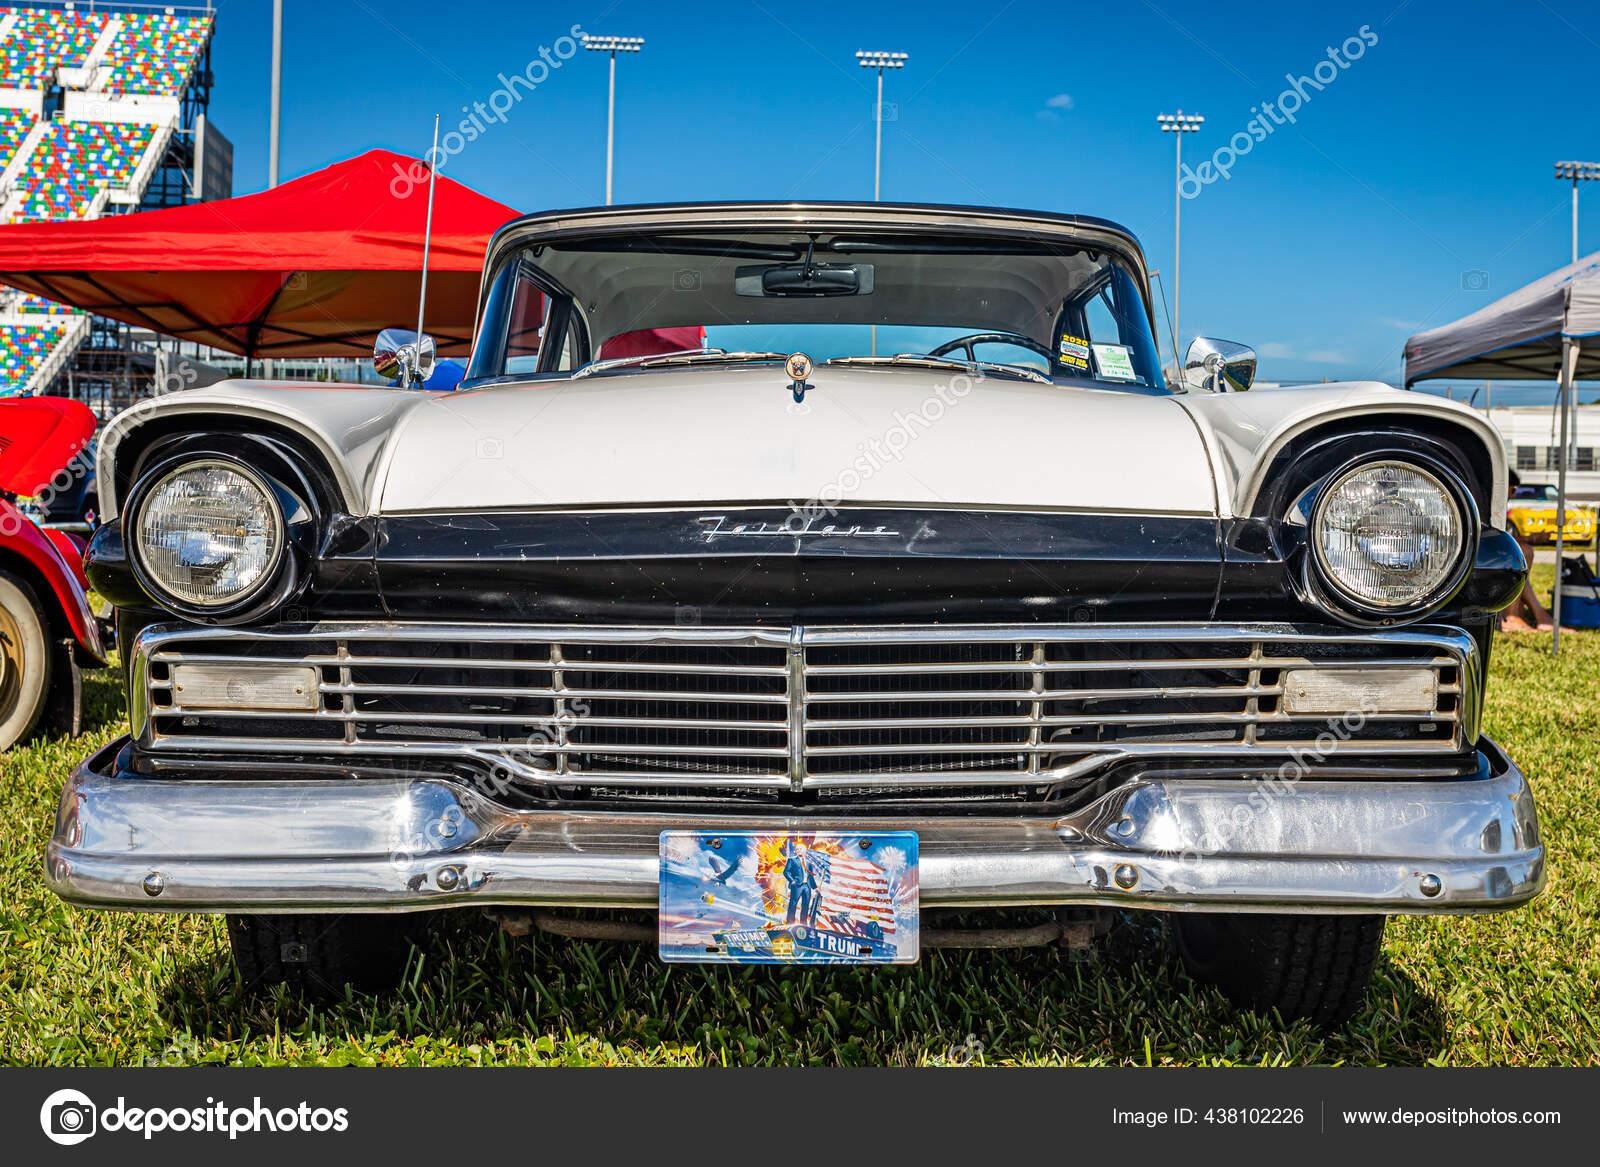 1957 Set 5 Ford Fairlane Texas Car Front Rear End Steering Wheel Love Photos Black White Photographs